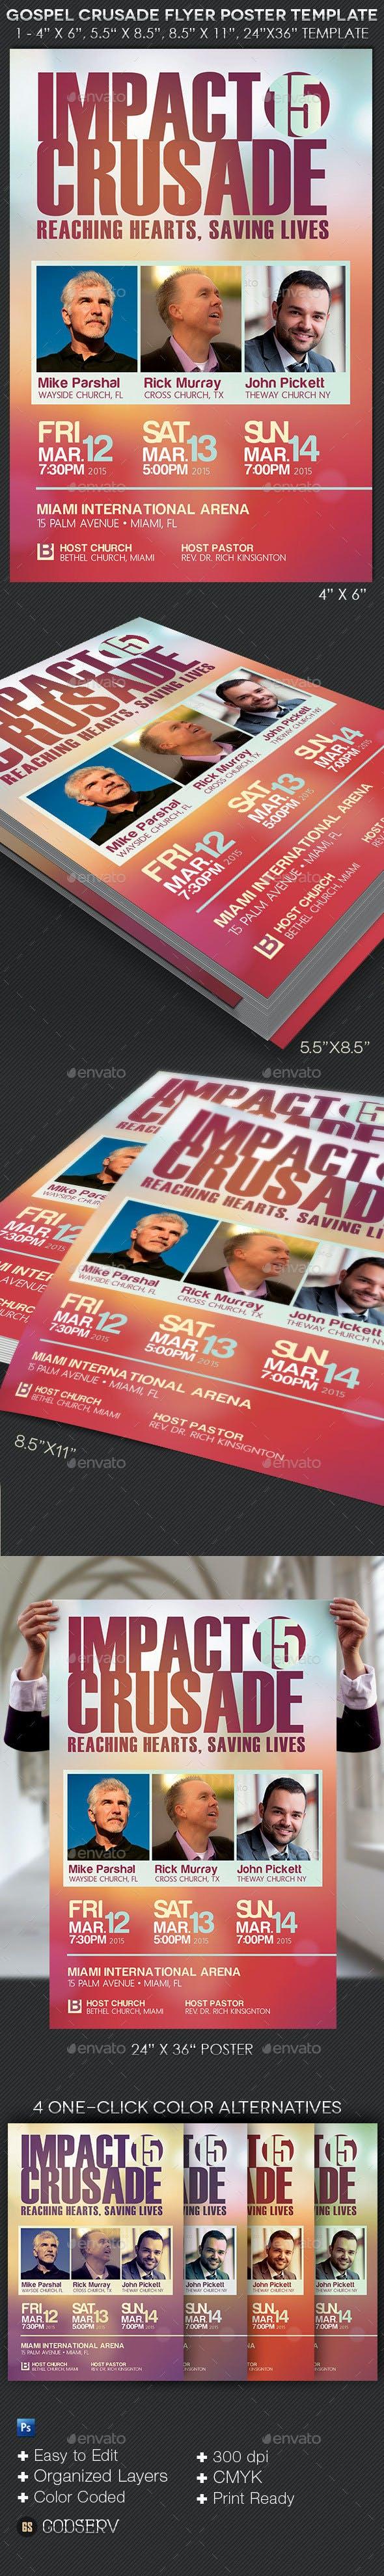 gospel crusade flyer poster template by godserv graphicriver